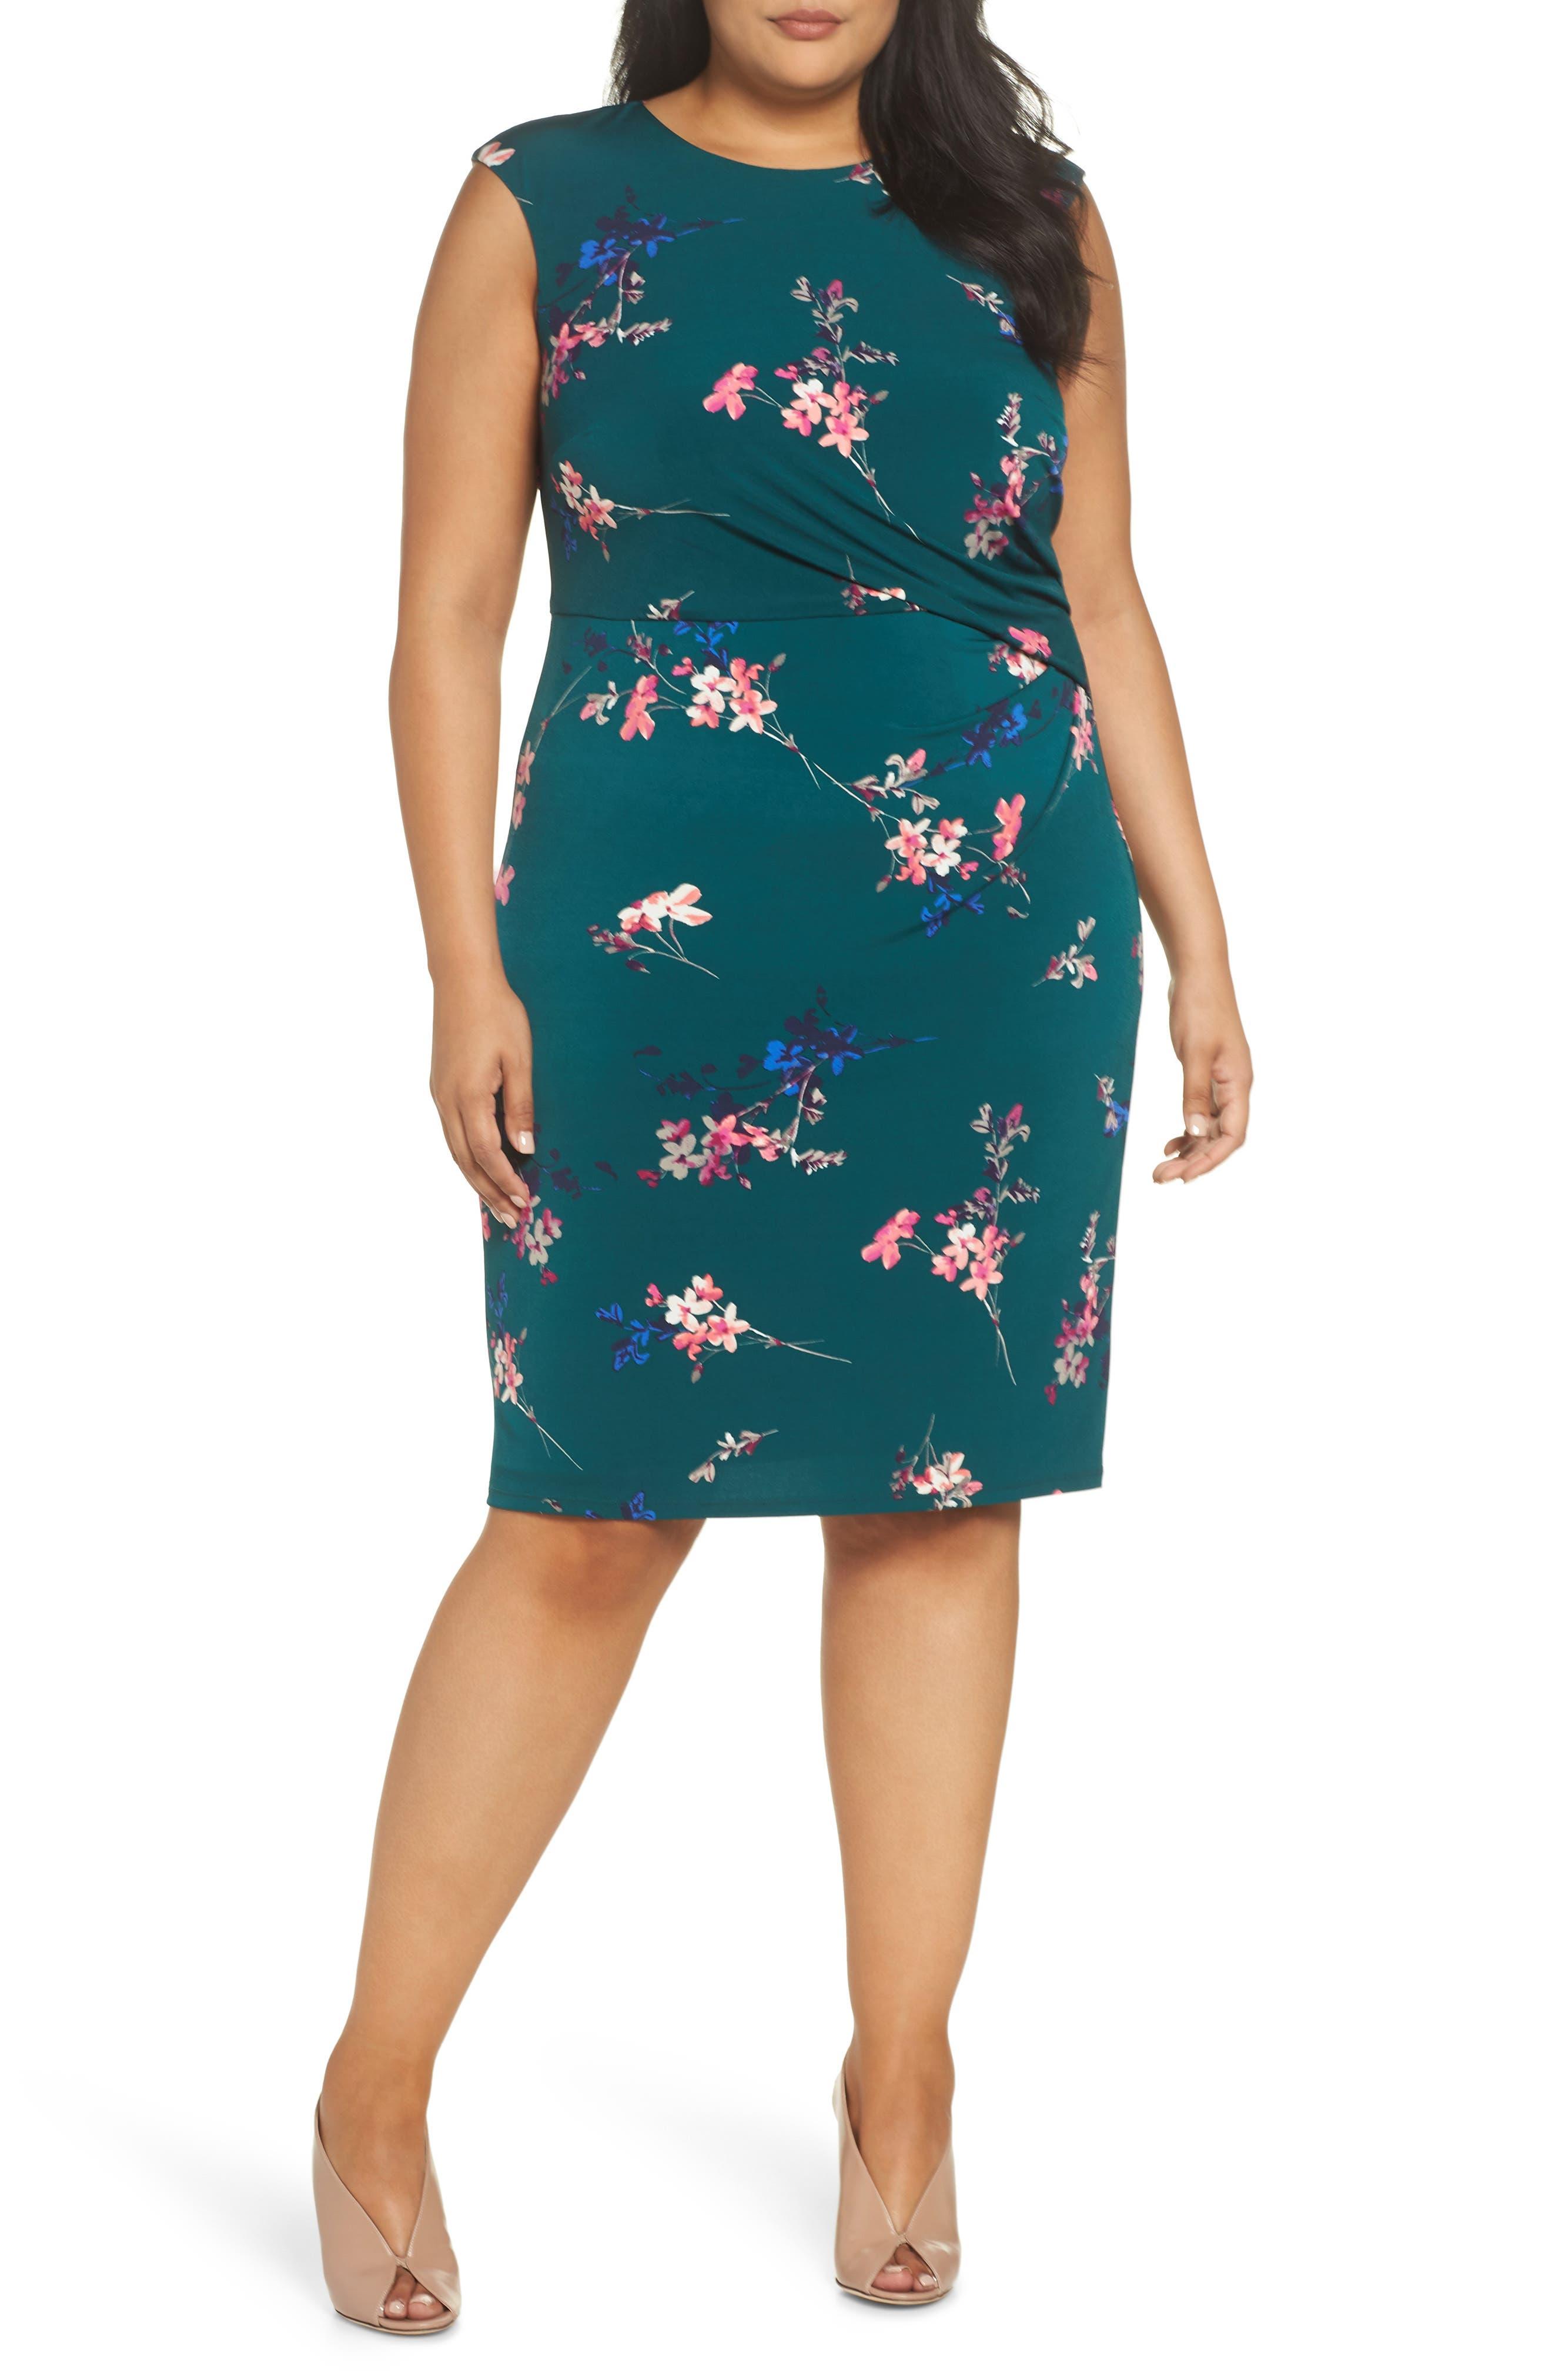 ELIZA J, Floral Print Cap Sleeve Sheath Dress, Main thumbnail 1, color, GREEN